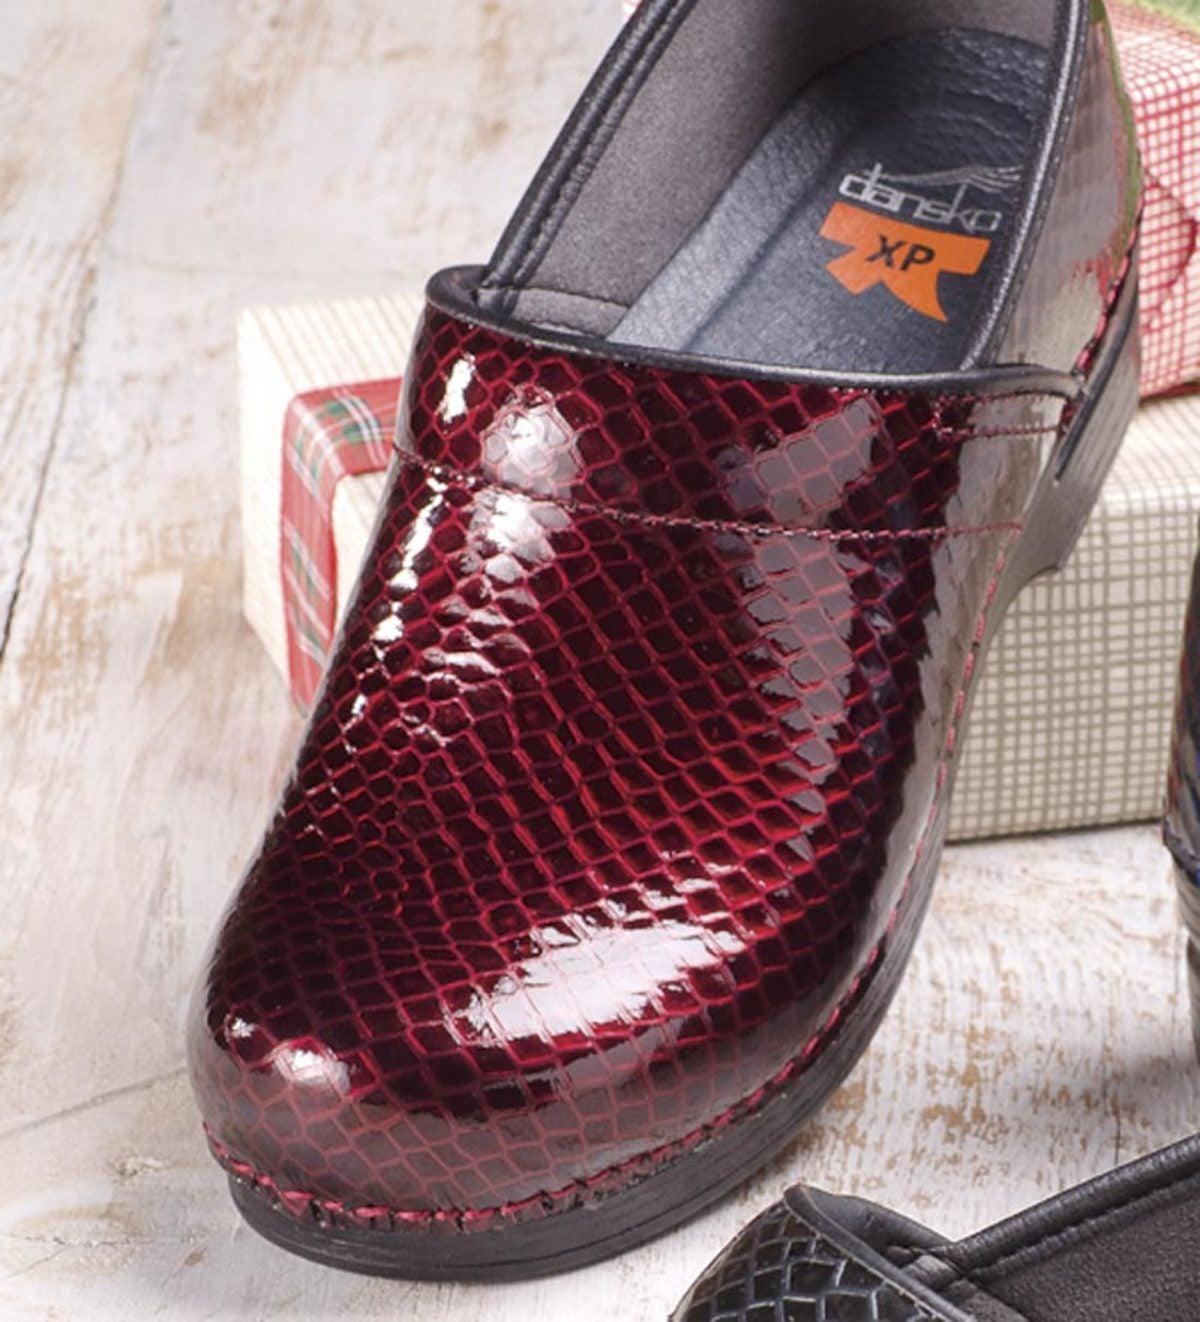 Dansko Shoe Replacement Insoles XP Met Footbed Womens size 36